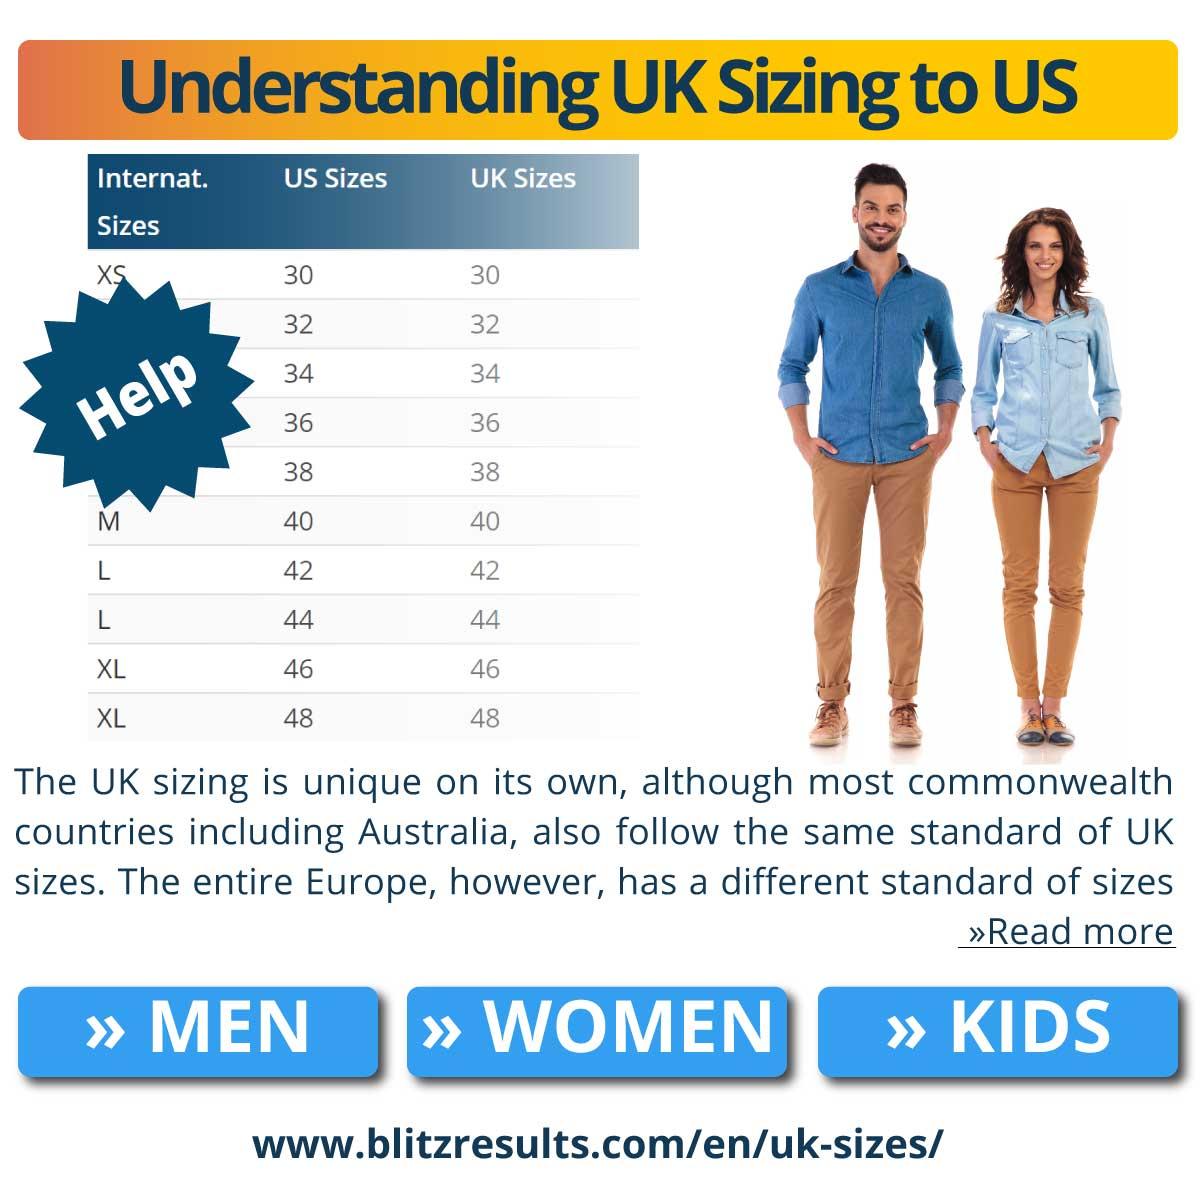 Understanding UK Sizing to US